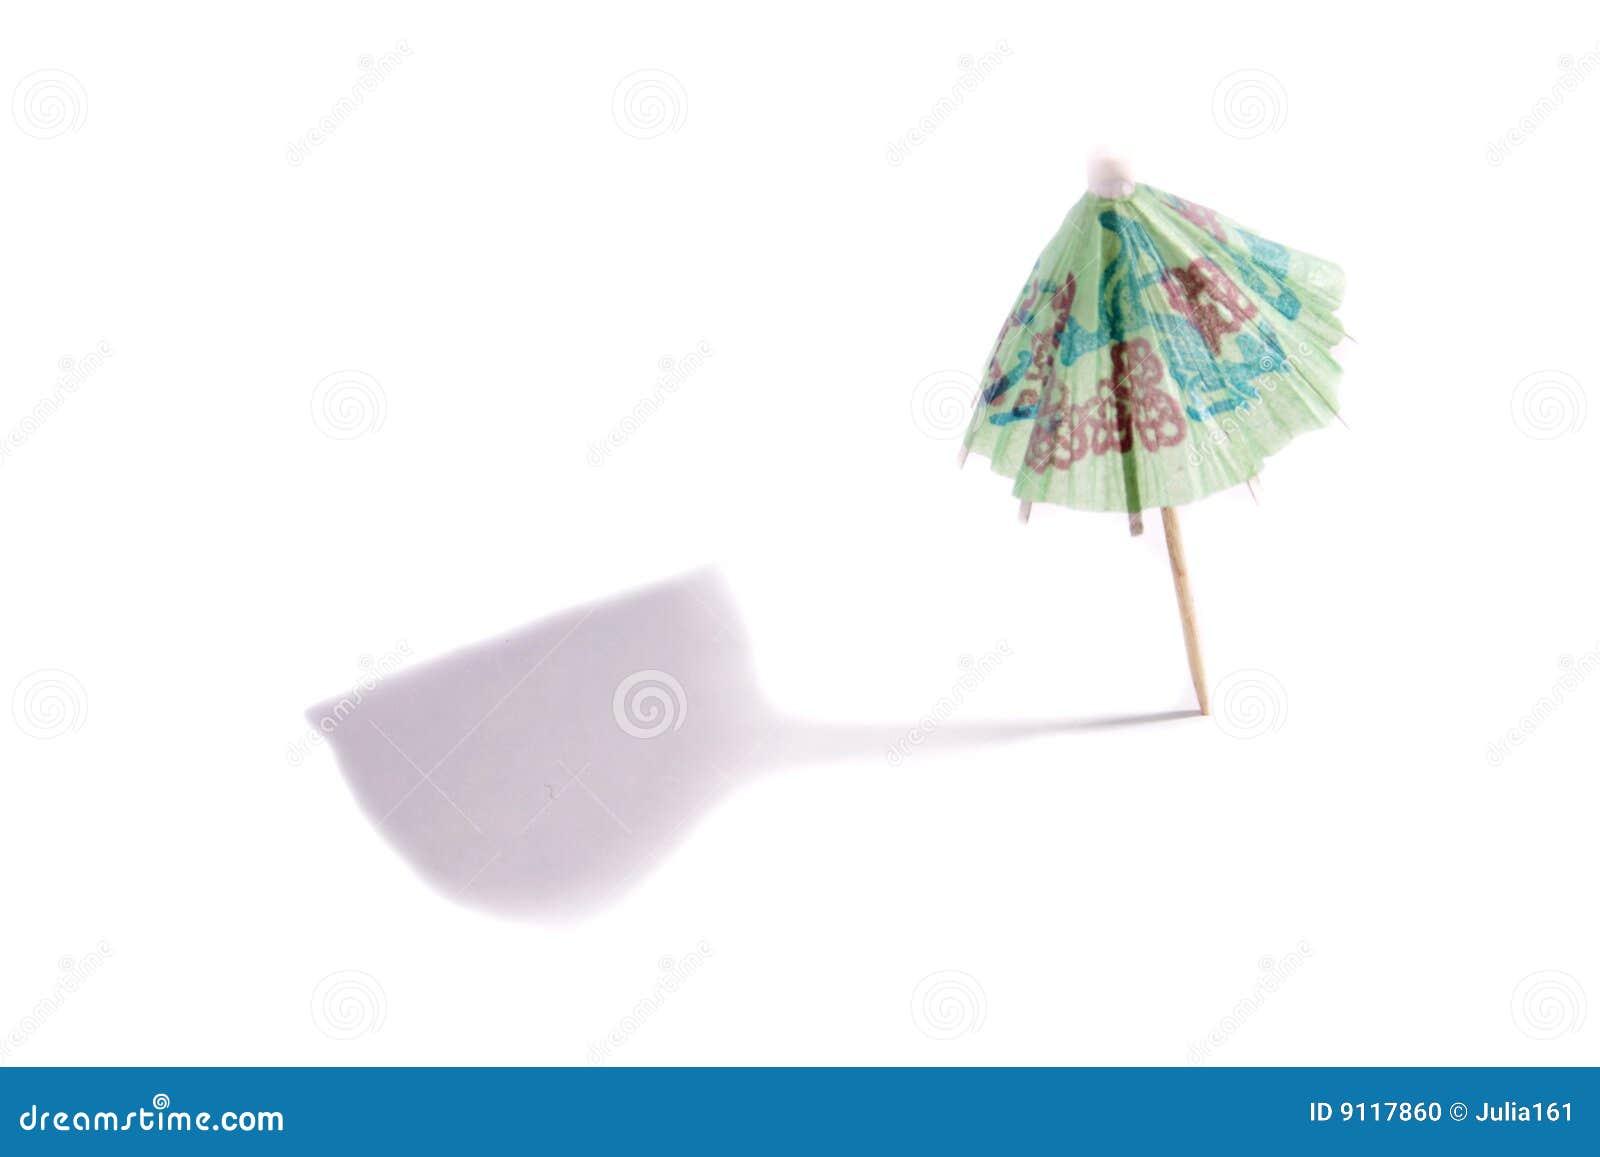 cocktail umbrella stock photo image 9117860